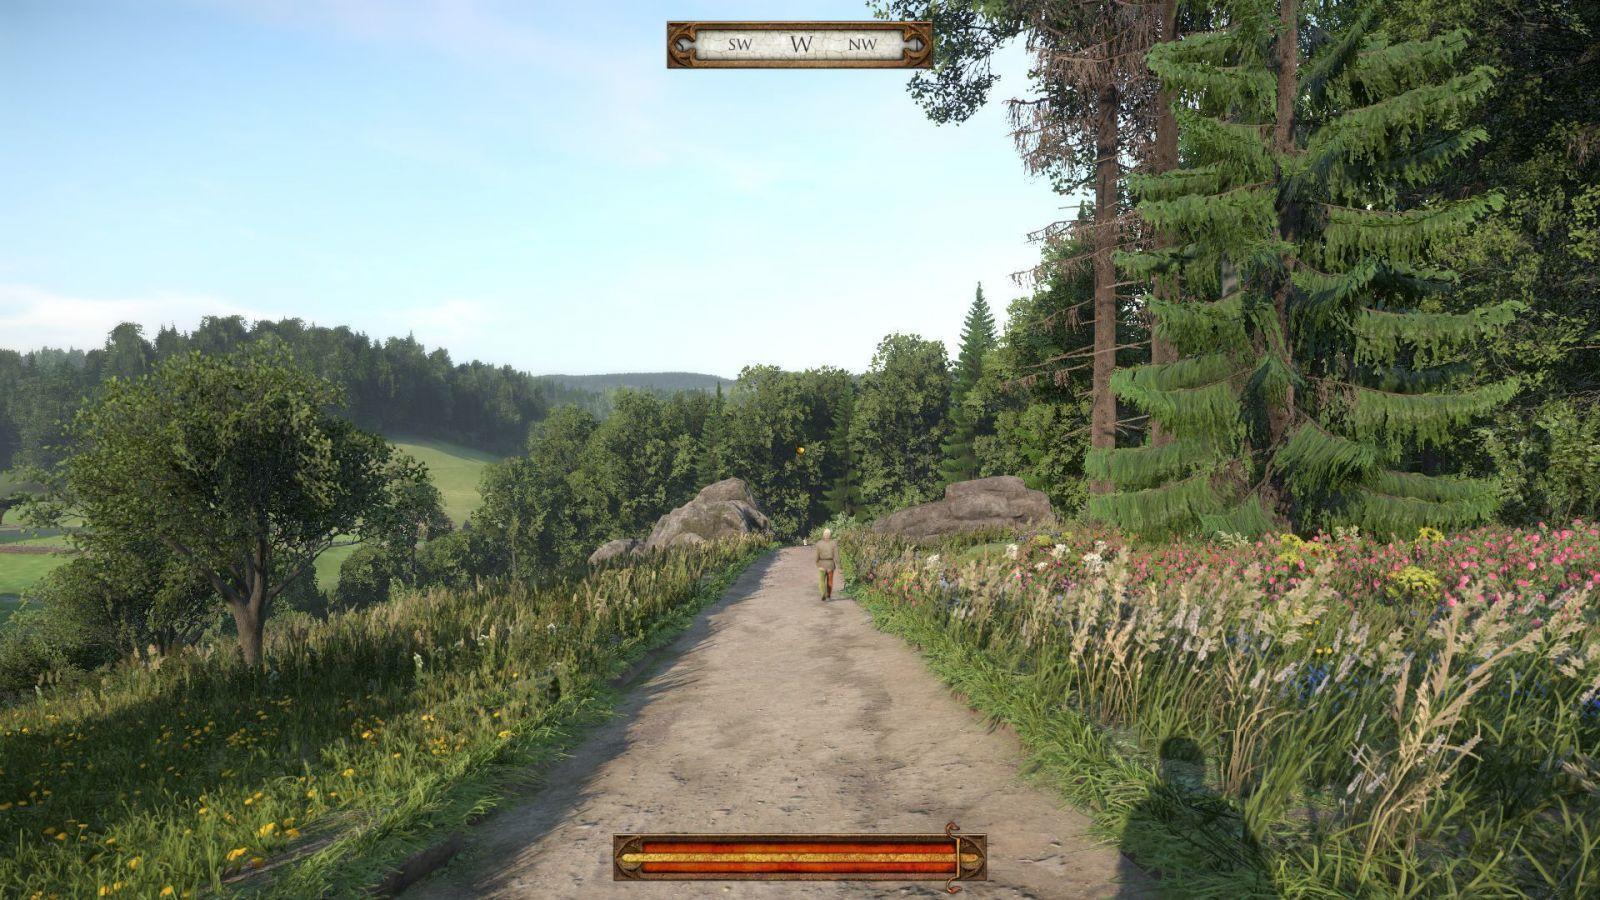 Компания Epic Games бесплатно разадаст копии игры Assassin's Creed Syndicate (wuo4vmvwzza5oihqf6k6pq)